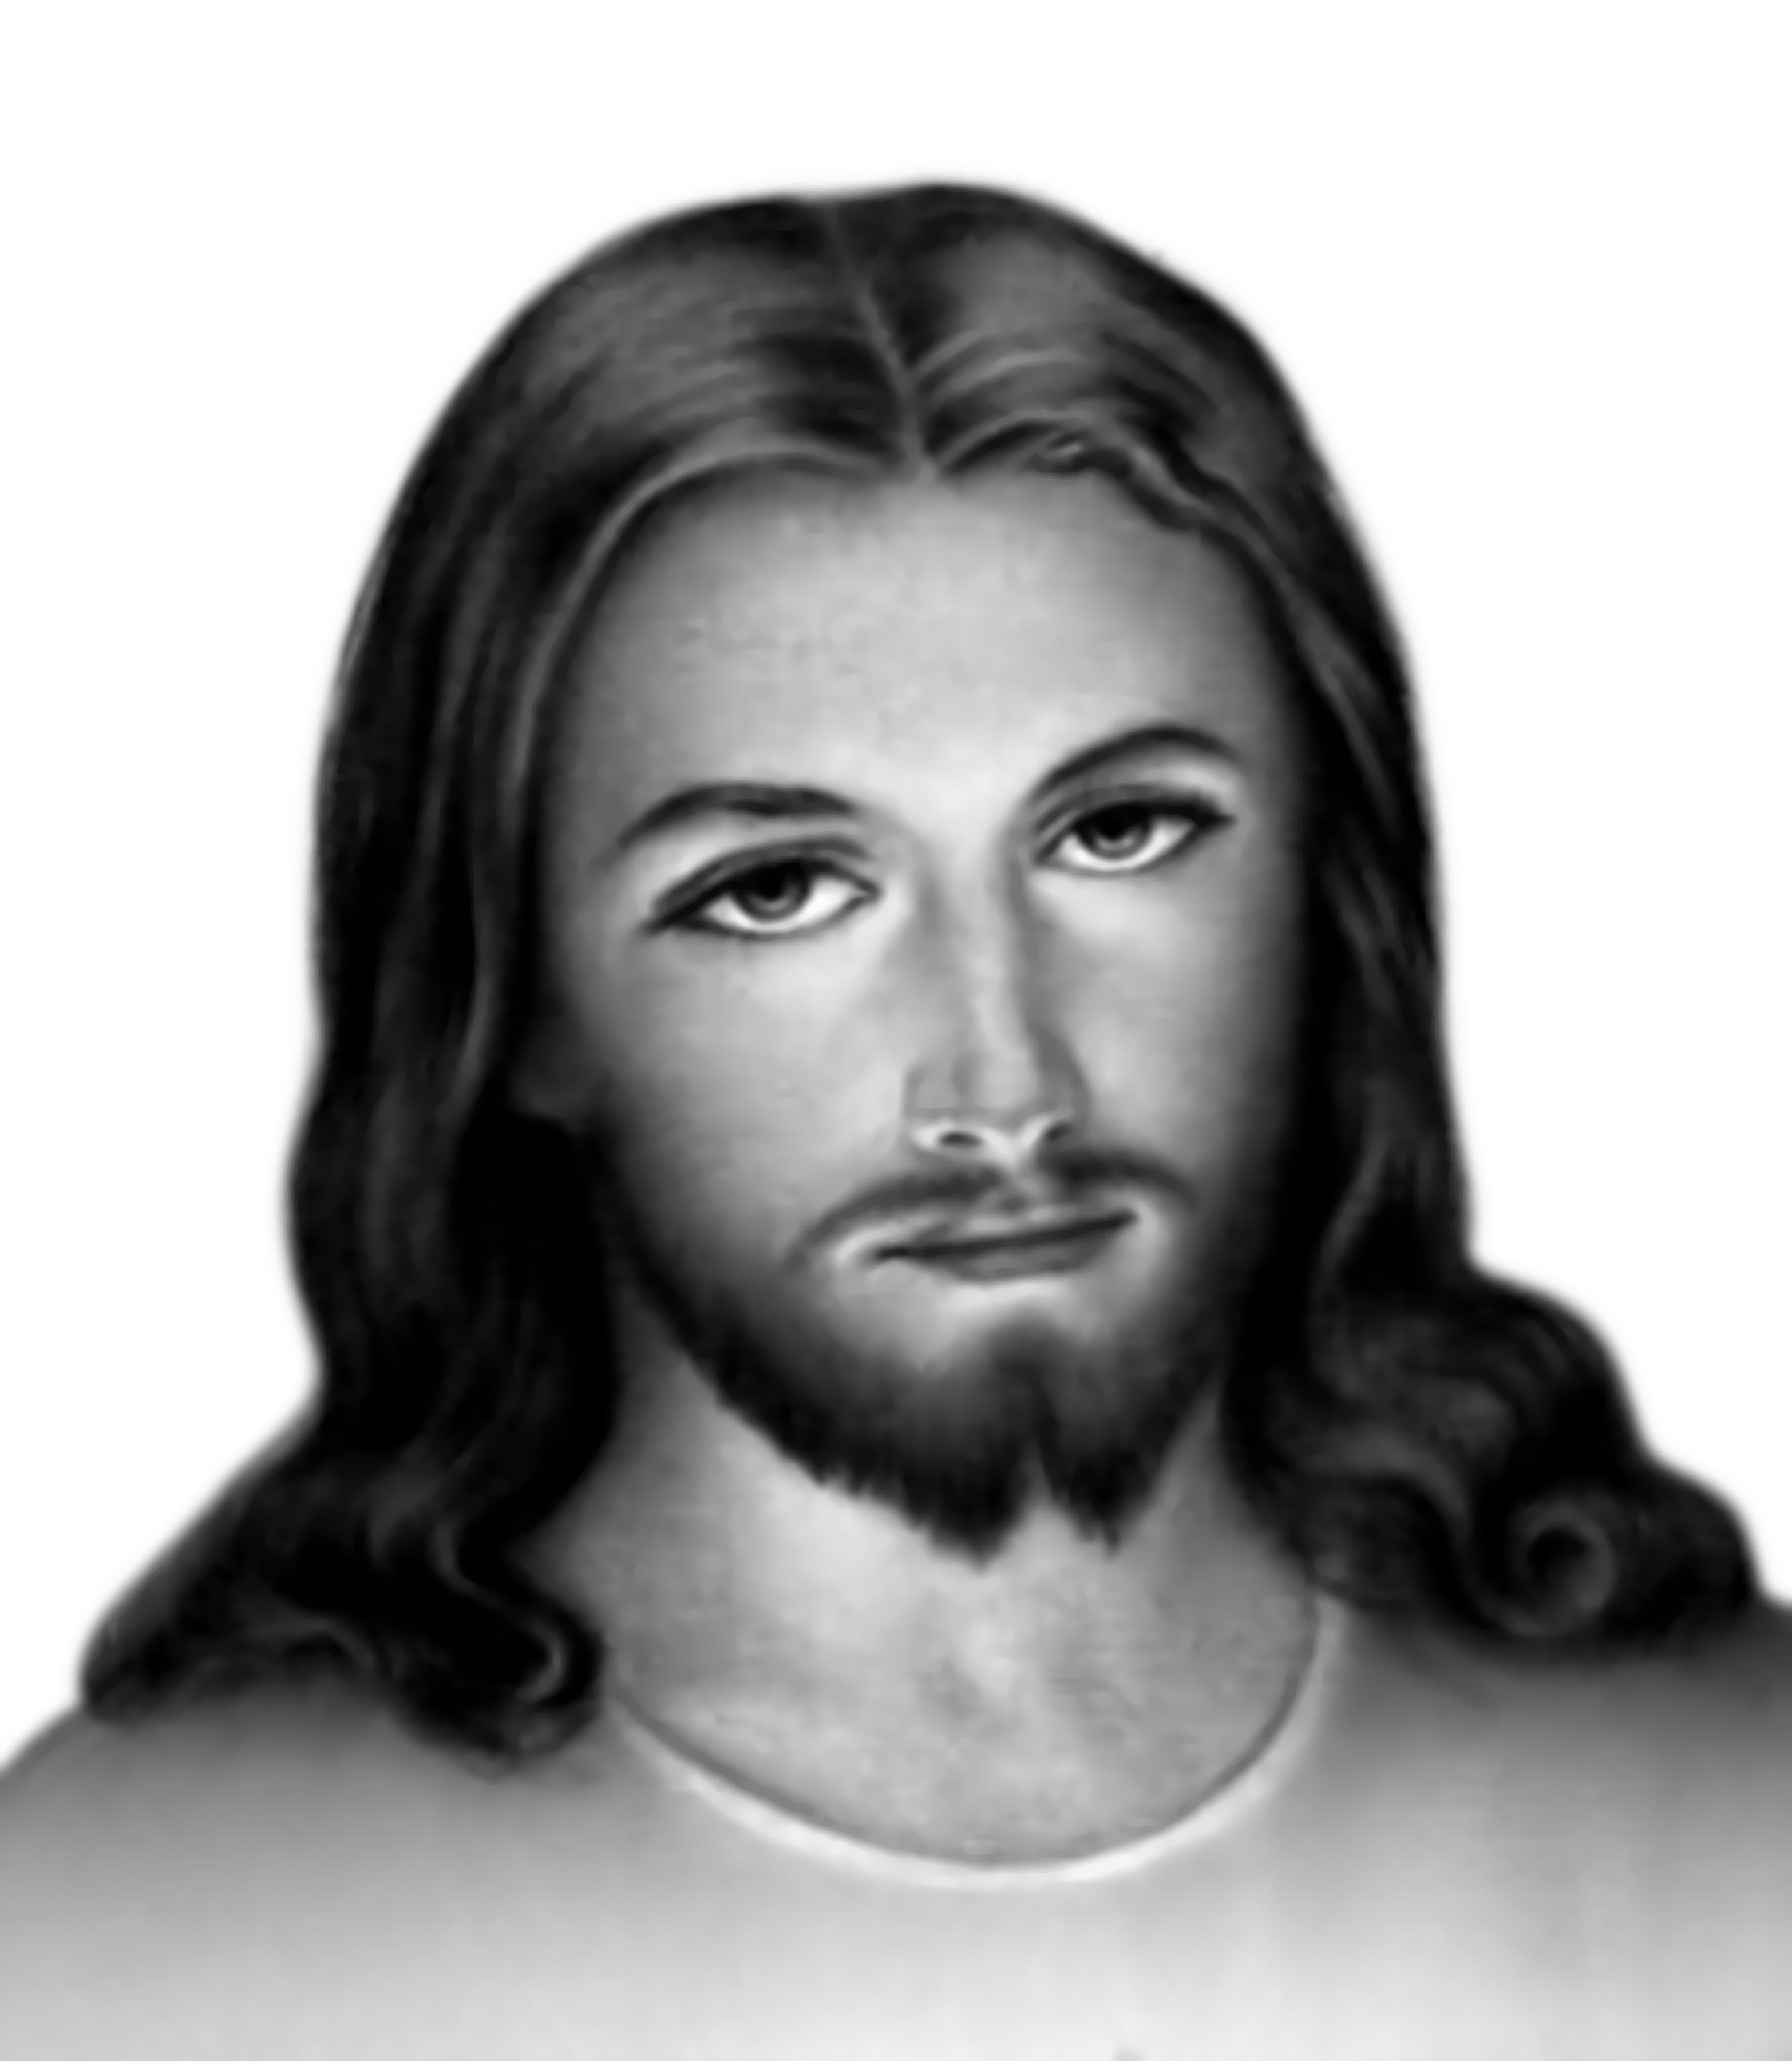 Бог Иисус PNG